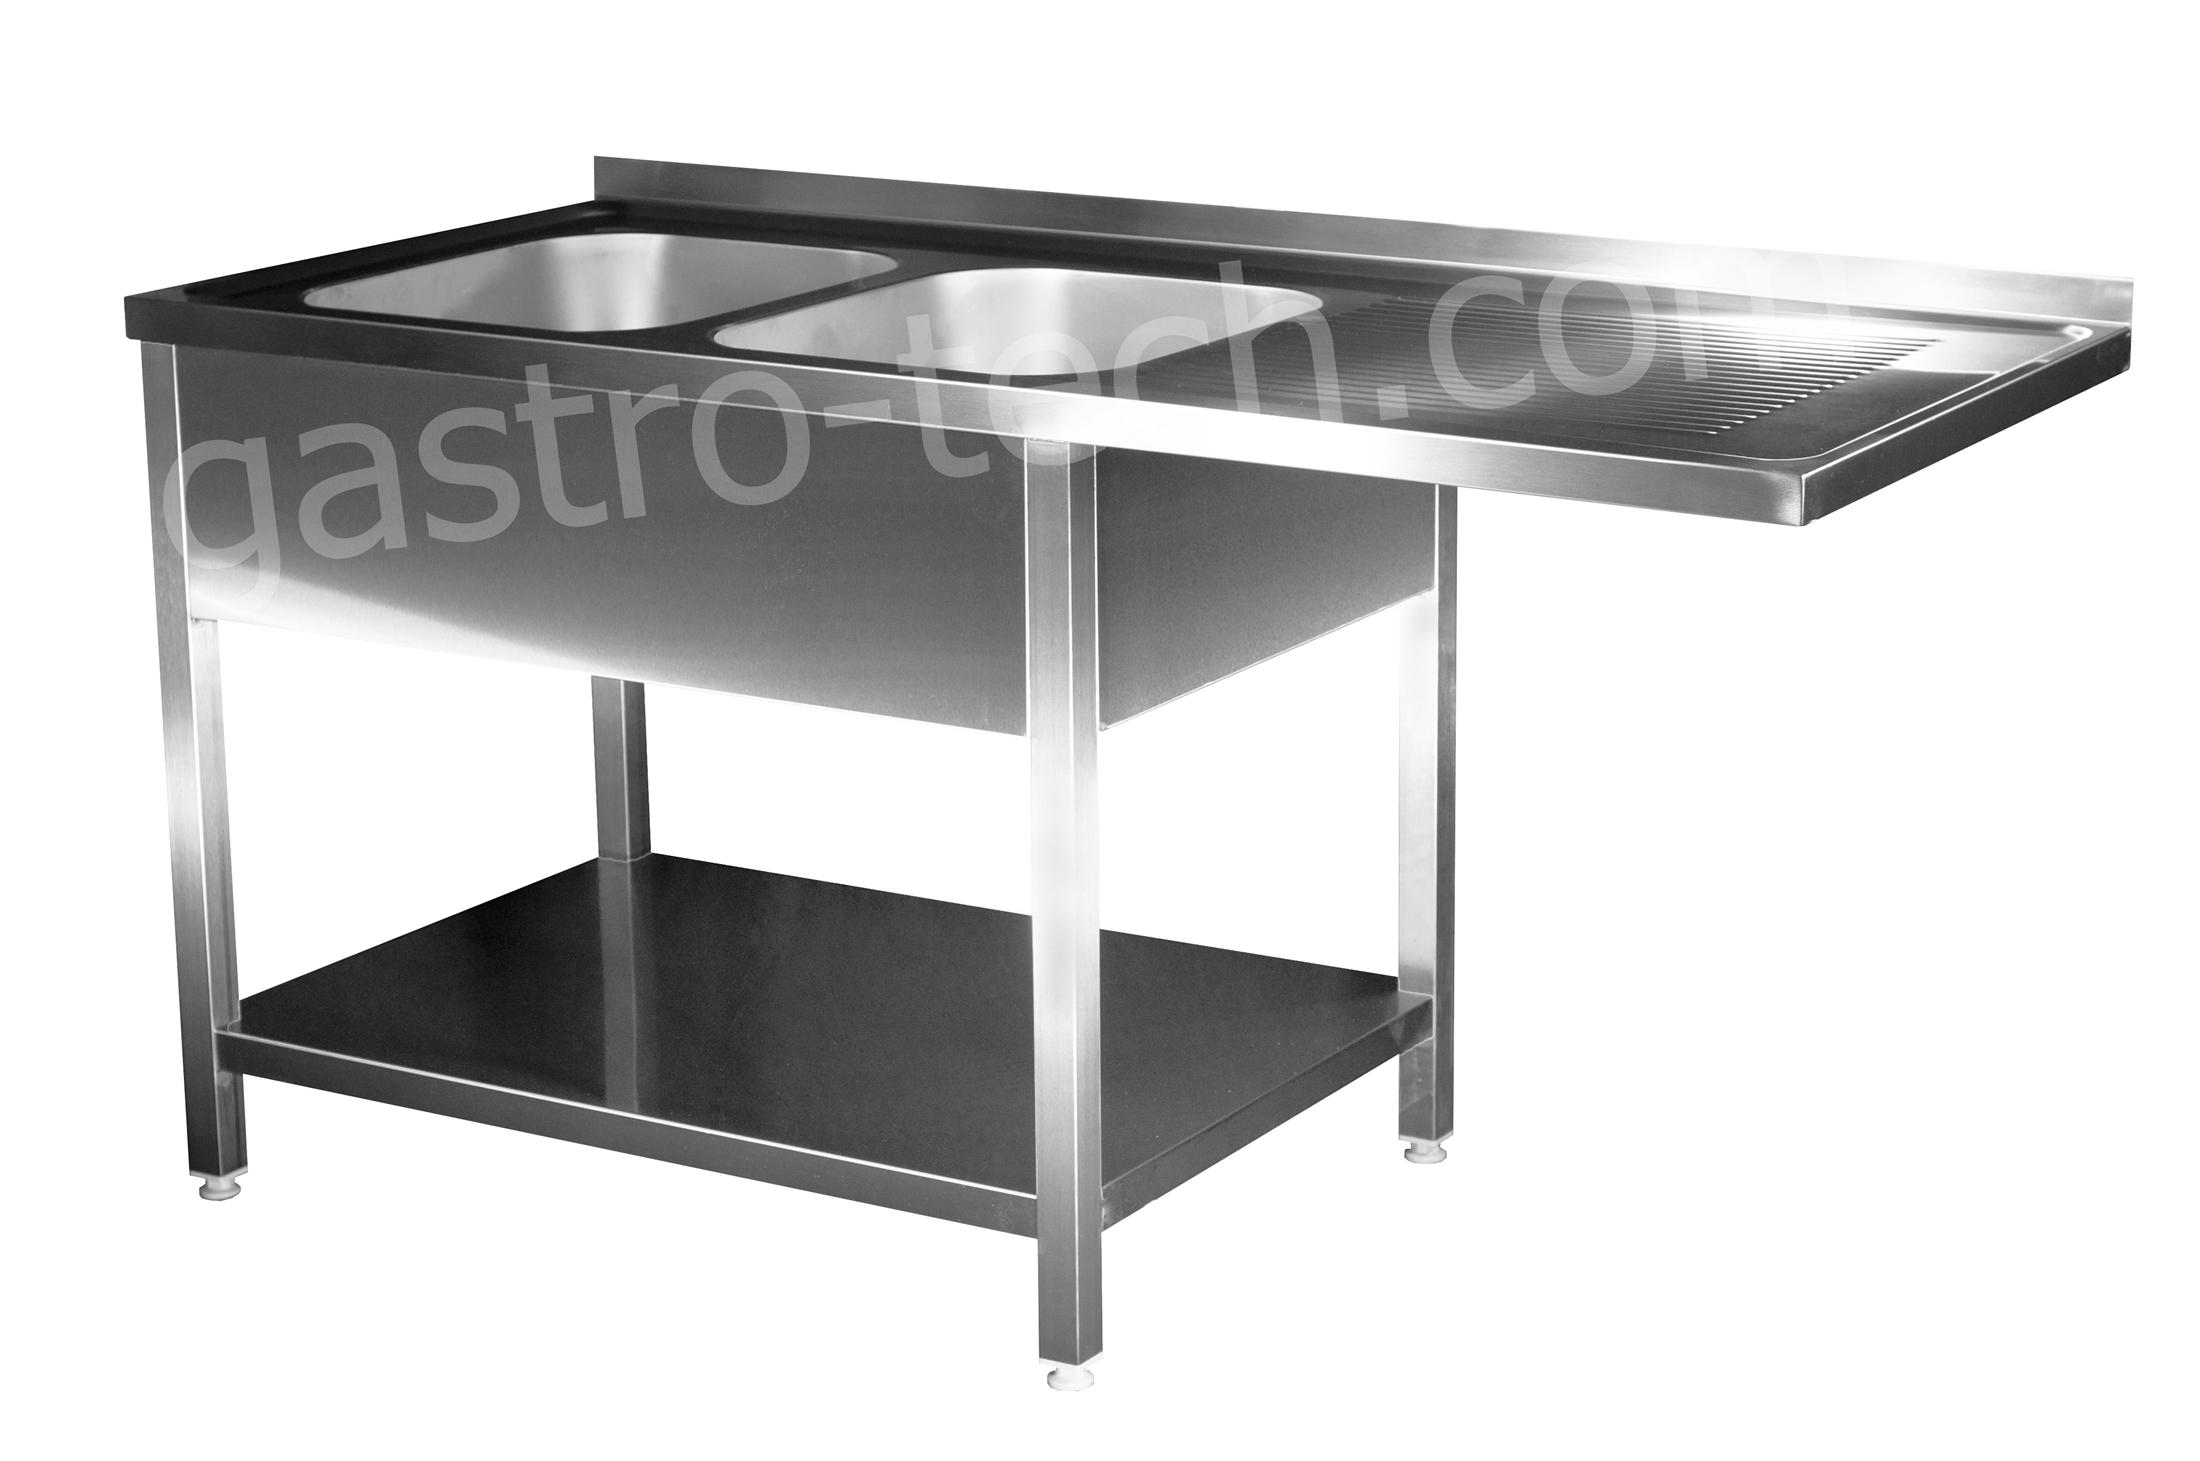 edelstahl sp lcenter b 190 t 70 h 85 2 be li verschwei t sp ltisch sp lmaschine ebay. Black Bedroom Furniture Sets. Home Design Ideas